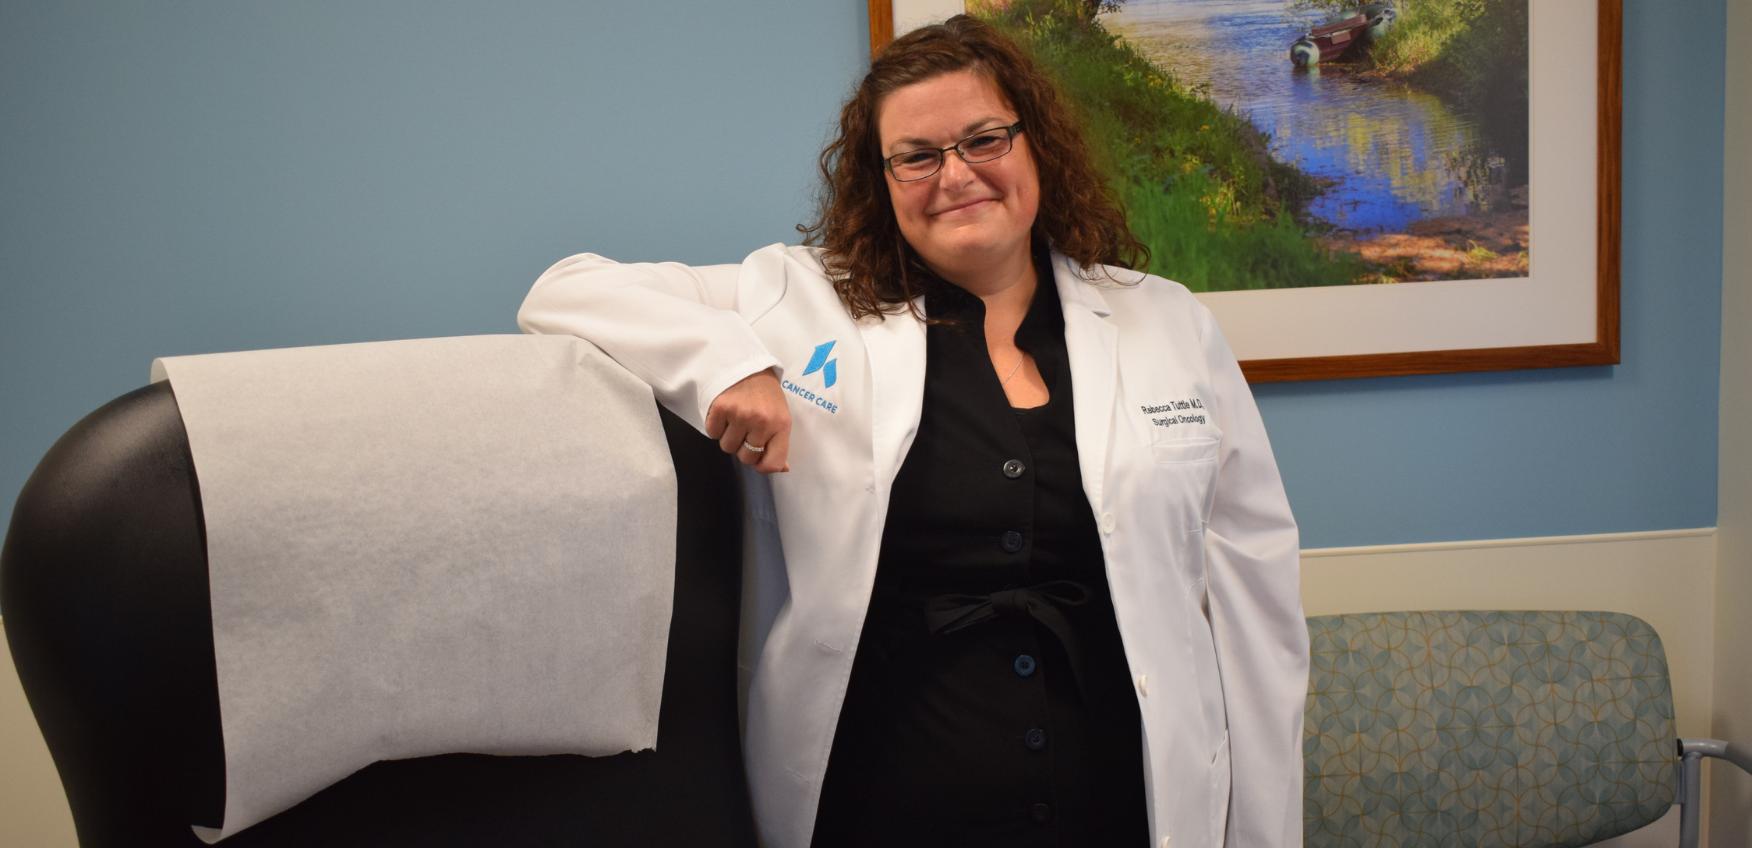 Dr. Tuttle in Patient Room